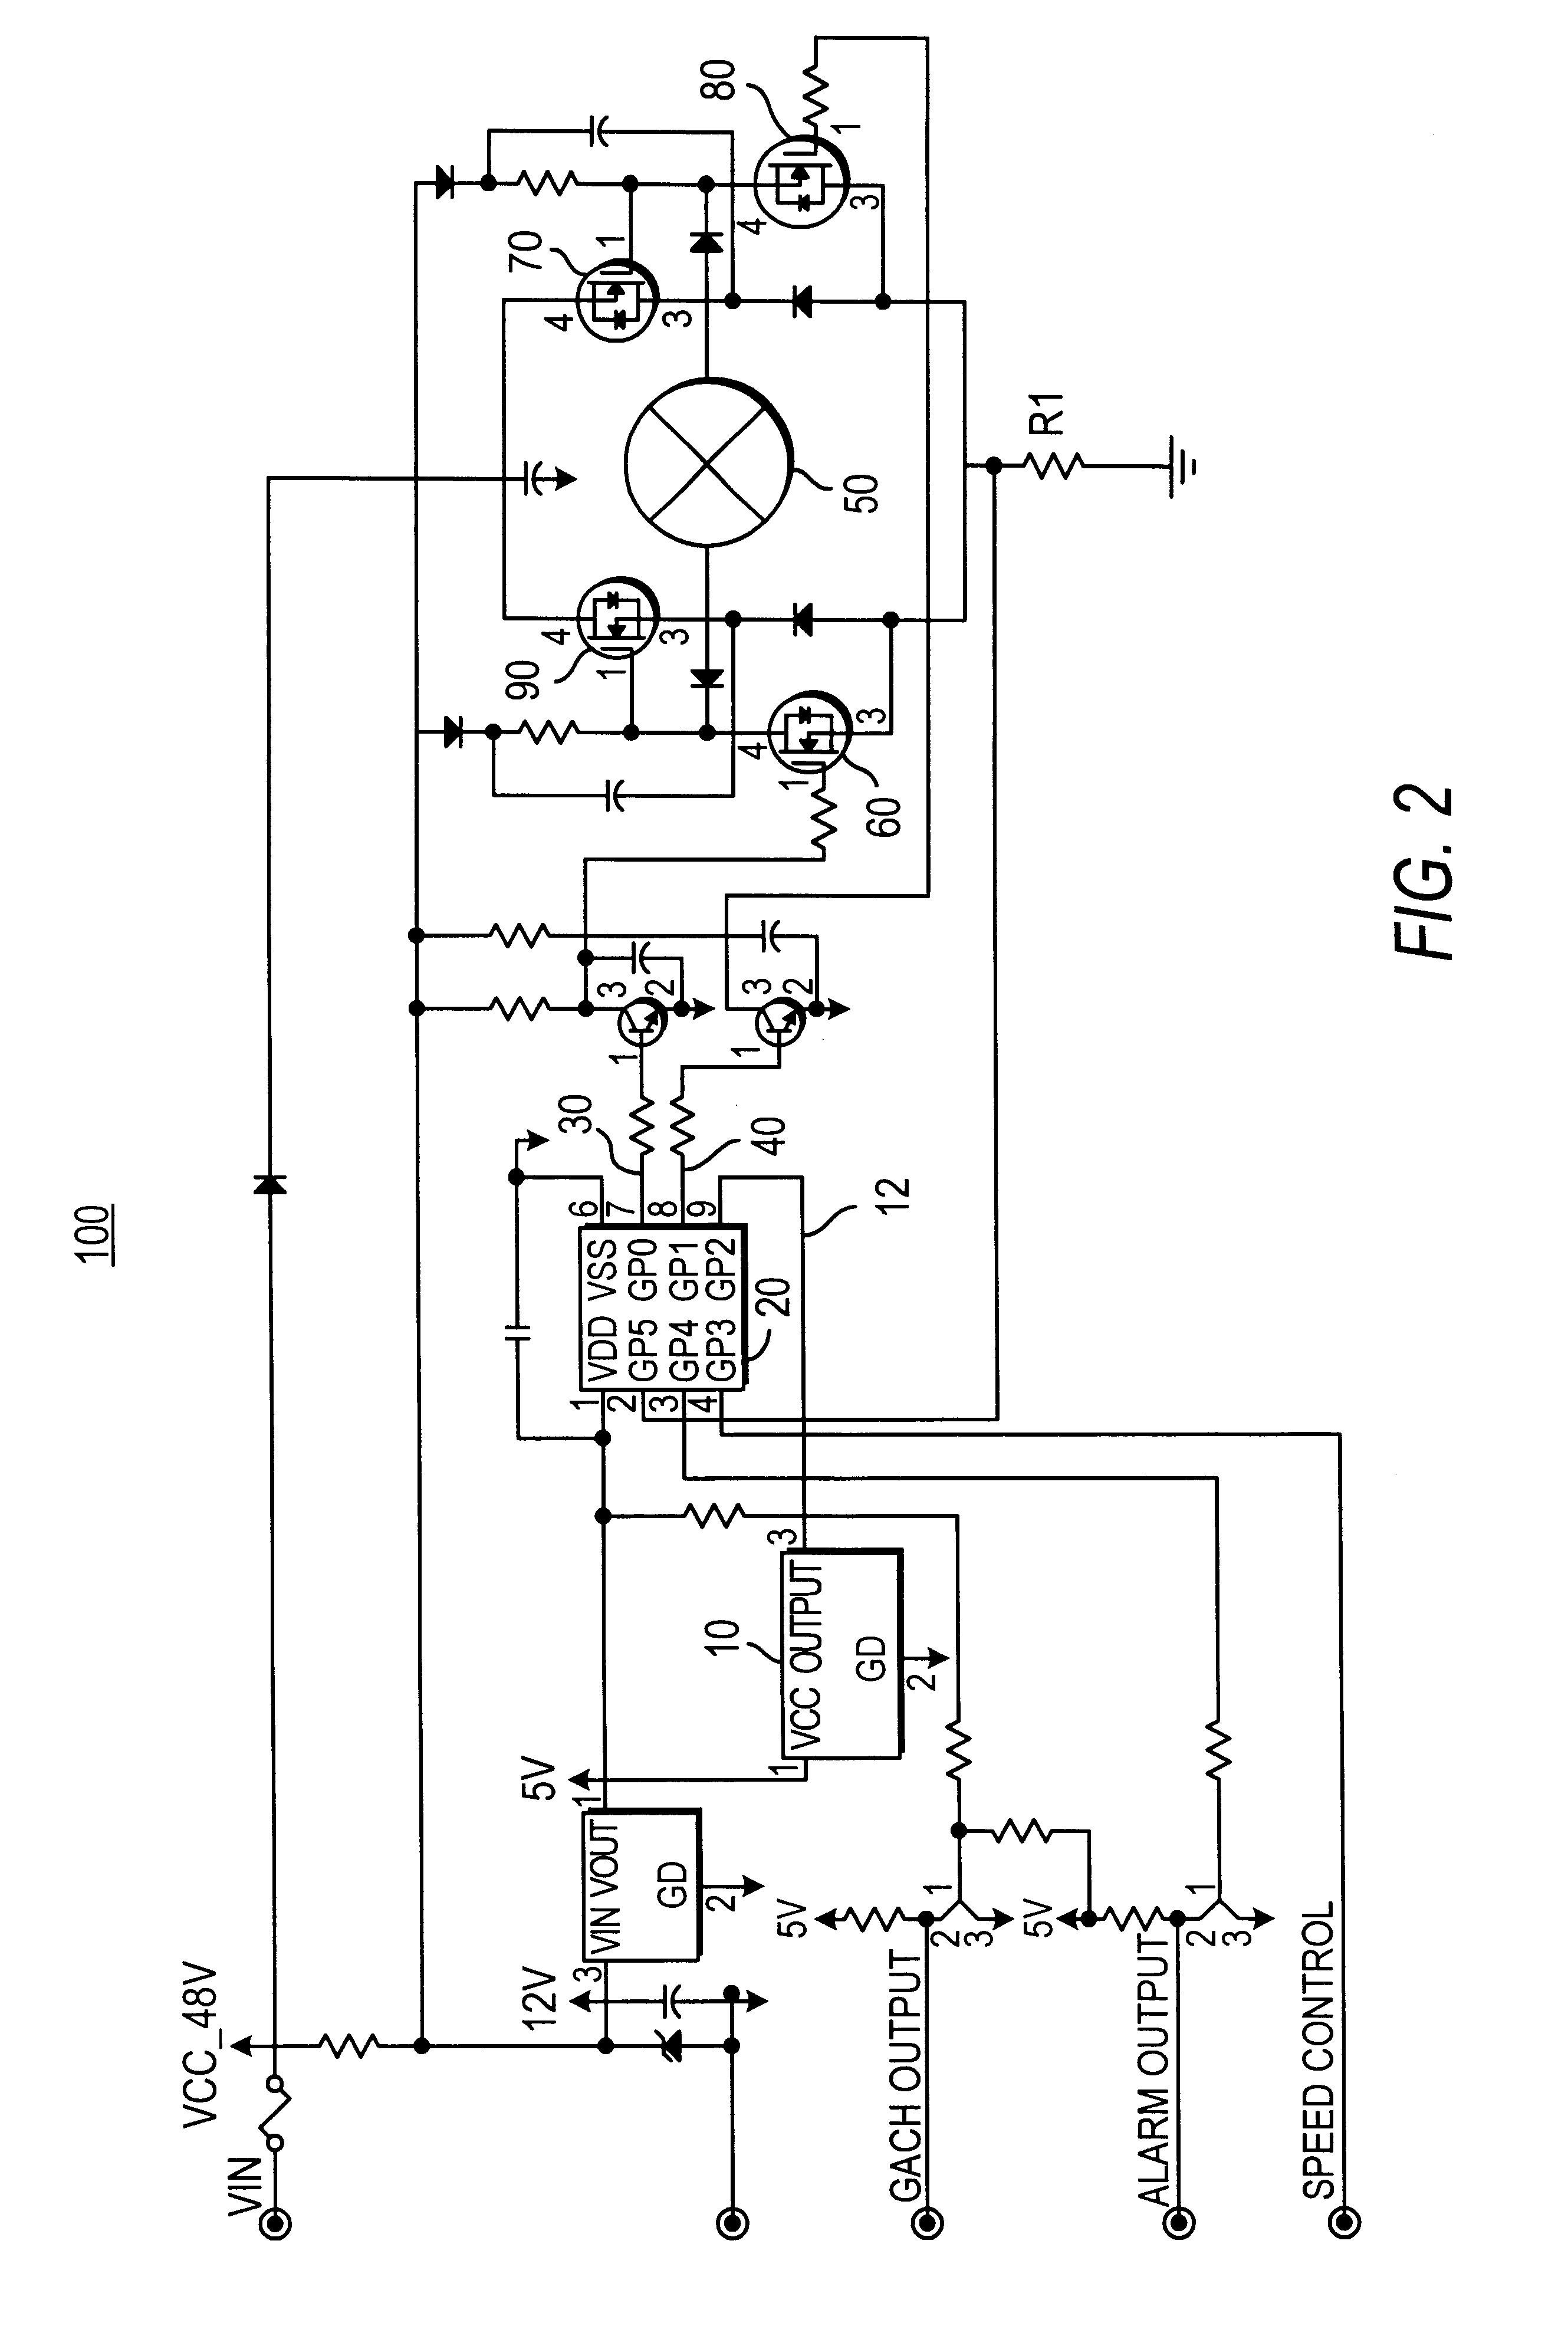 motor starter hand off auto wiring diagram wiring library Cutler Hammer Parts List